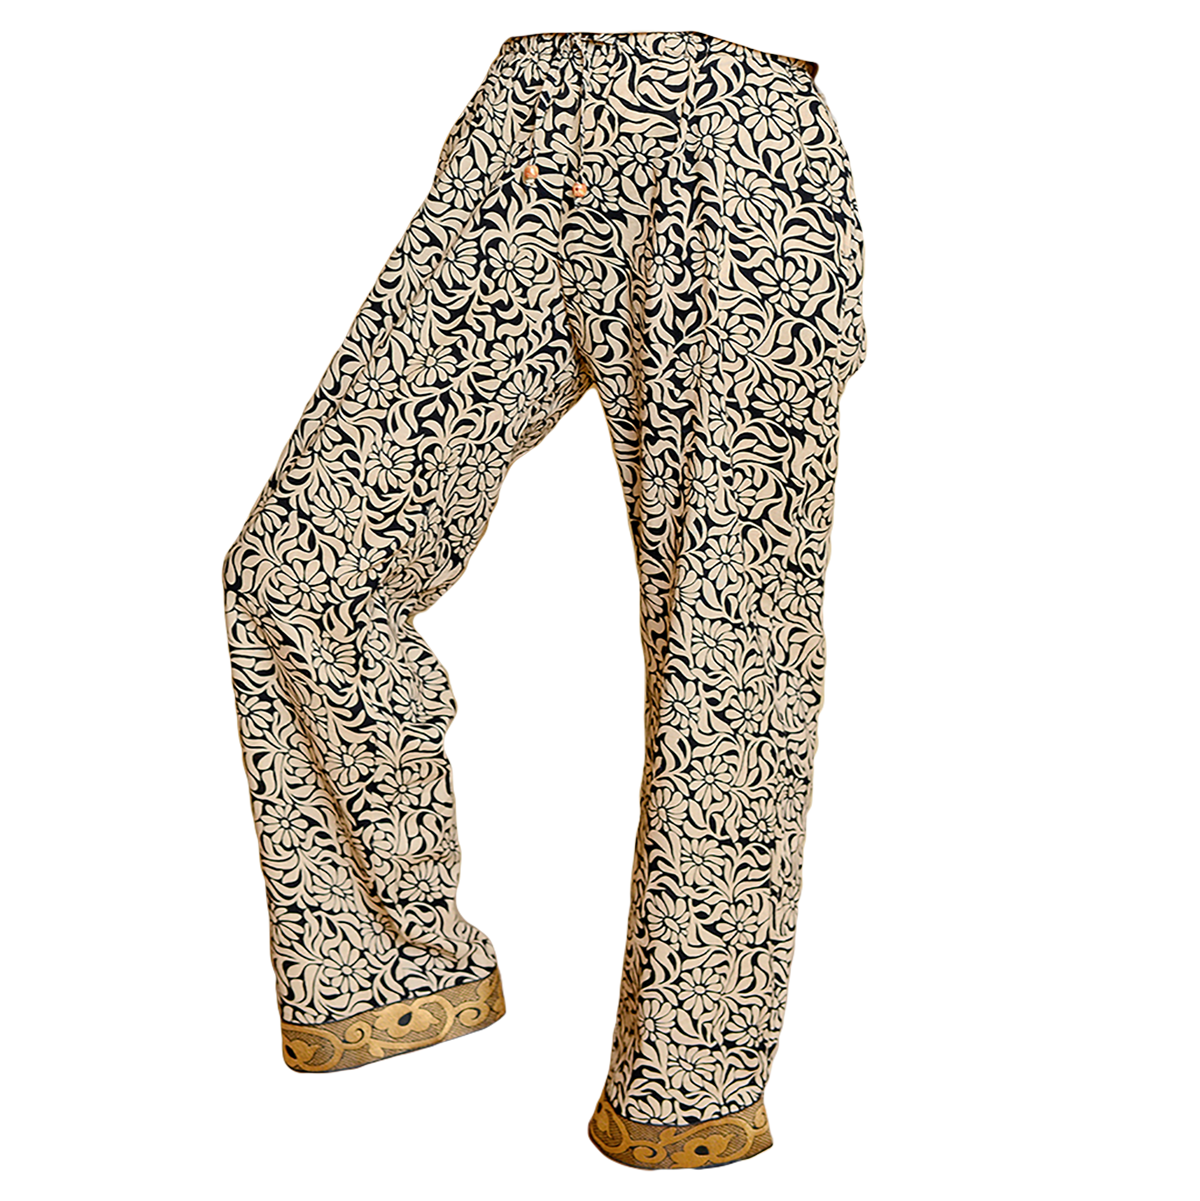 Sudara Kaveri Ivory Full Punjammies® Lounge Pant  $54